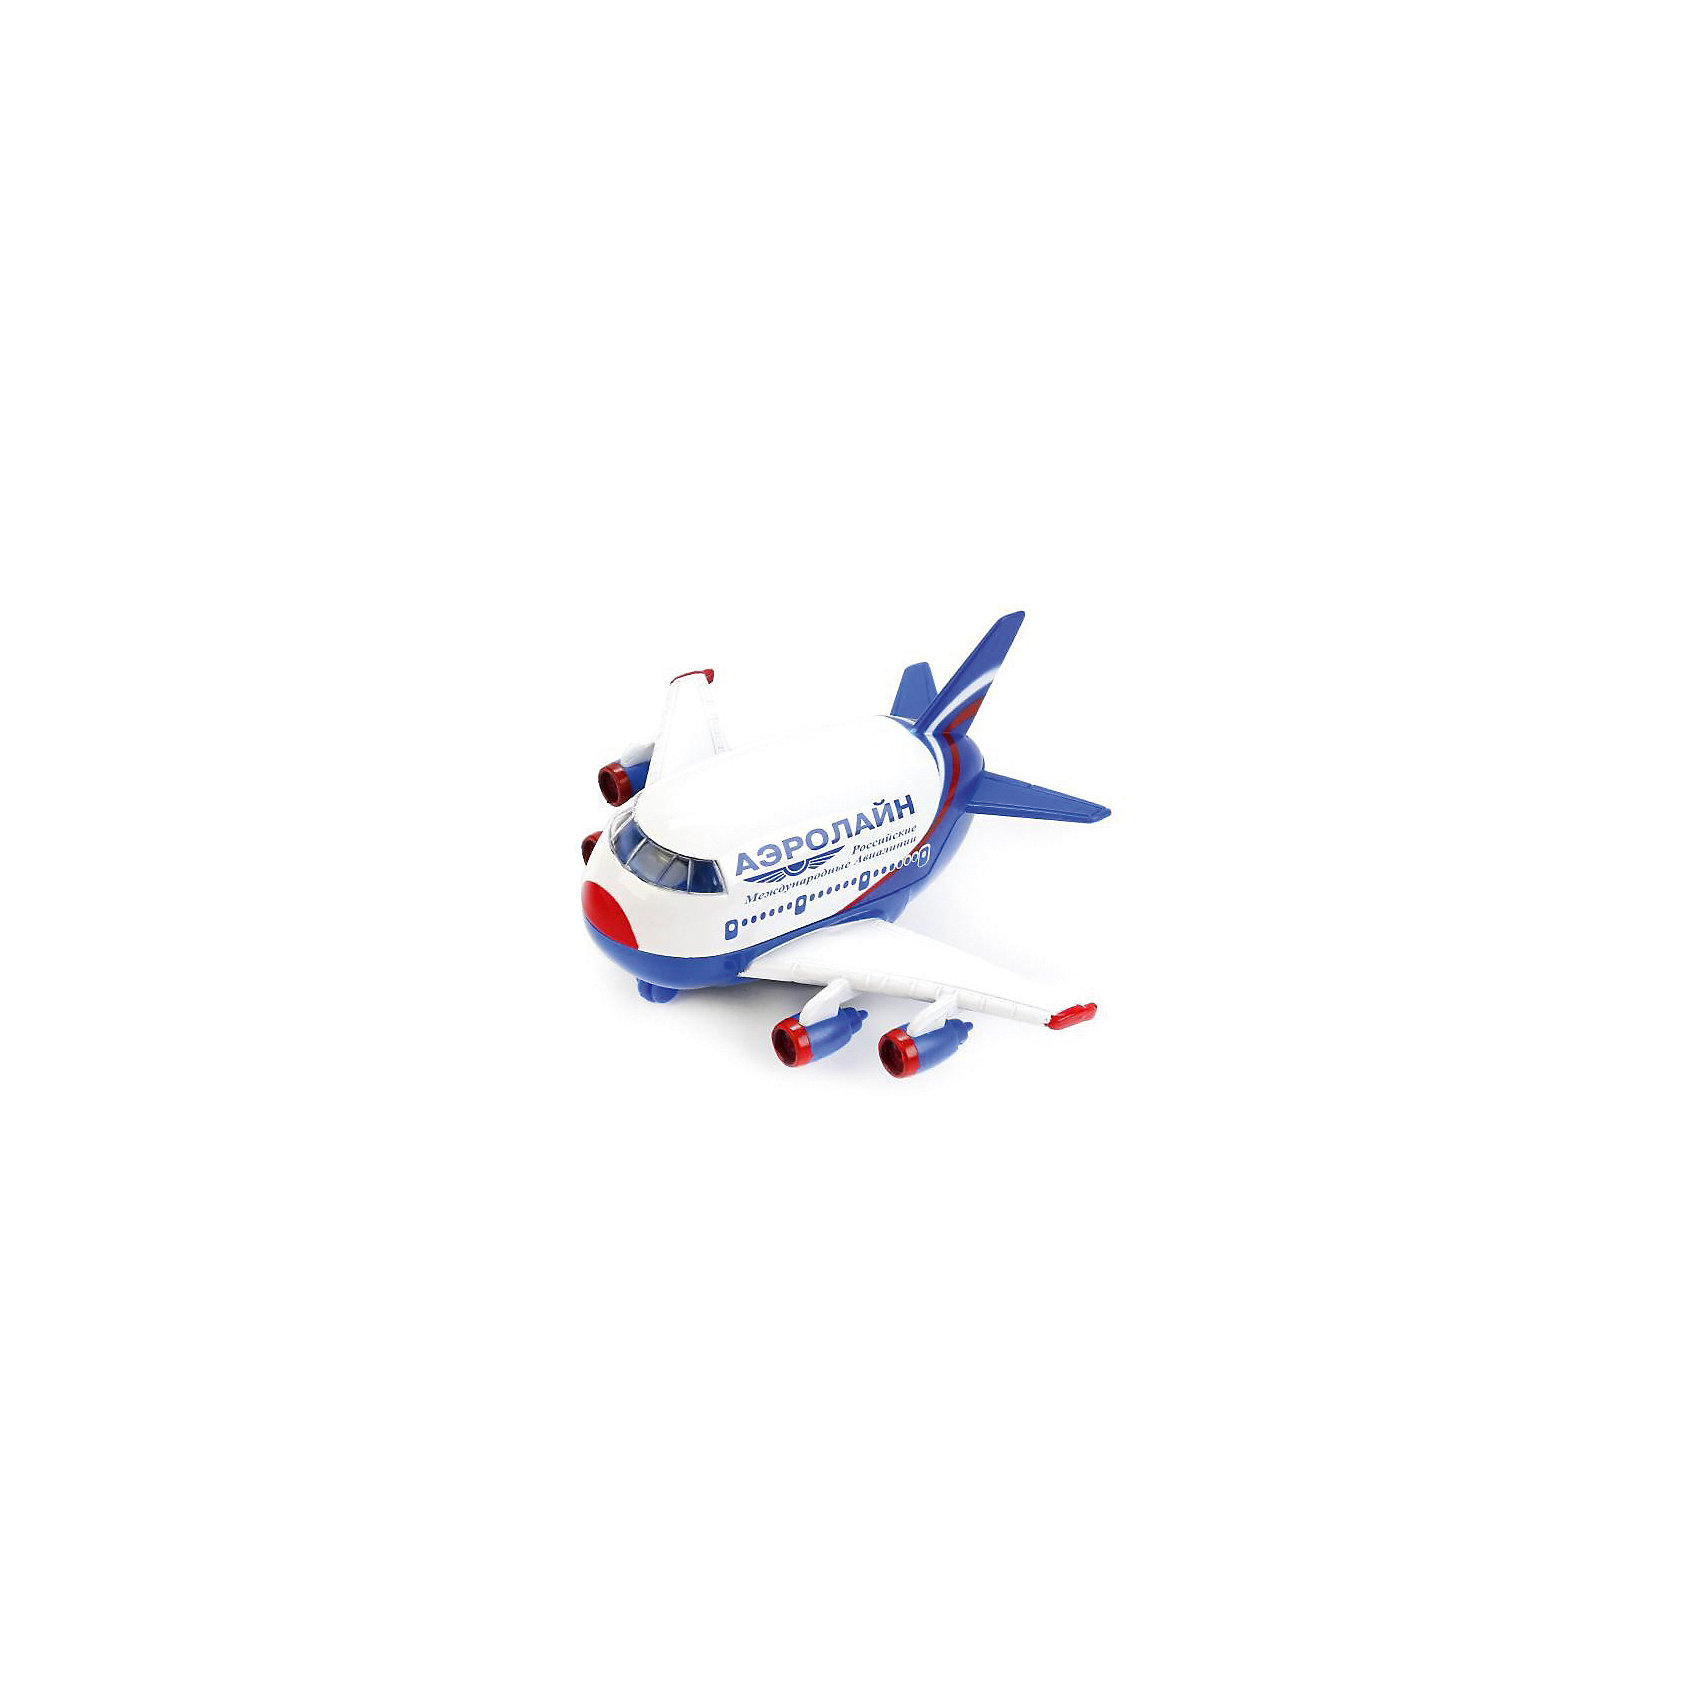 Самолет, свет+звук, ТЕХНОПАРКСамолёты и вертолёты<br>Самолет, металл., инерц., свет+звук.<br><br>Ширина мм: 120<br>Глубина мм: 130<br>Высота мм: 150<br>Вес г: 170<br>Возраст от месяцев: 36<br>Возраст до месяцев: 84<br>Пол: Мужской<br>Возраст: Детский<br>SKU: 5420360